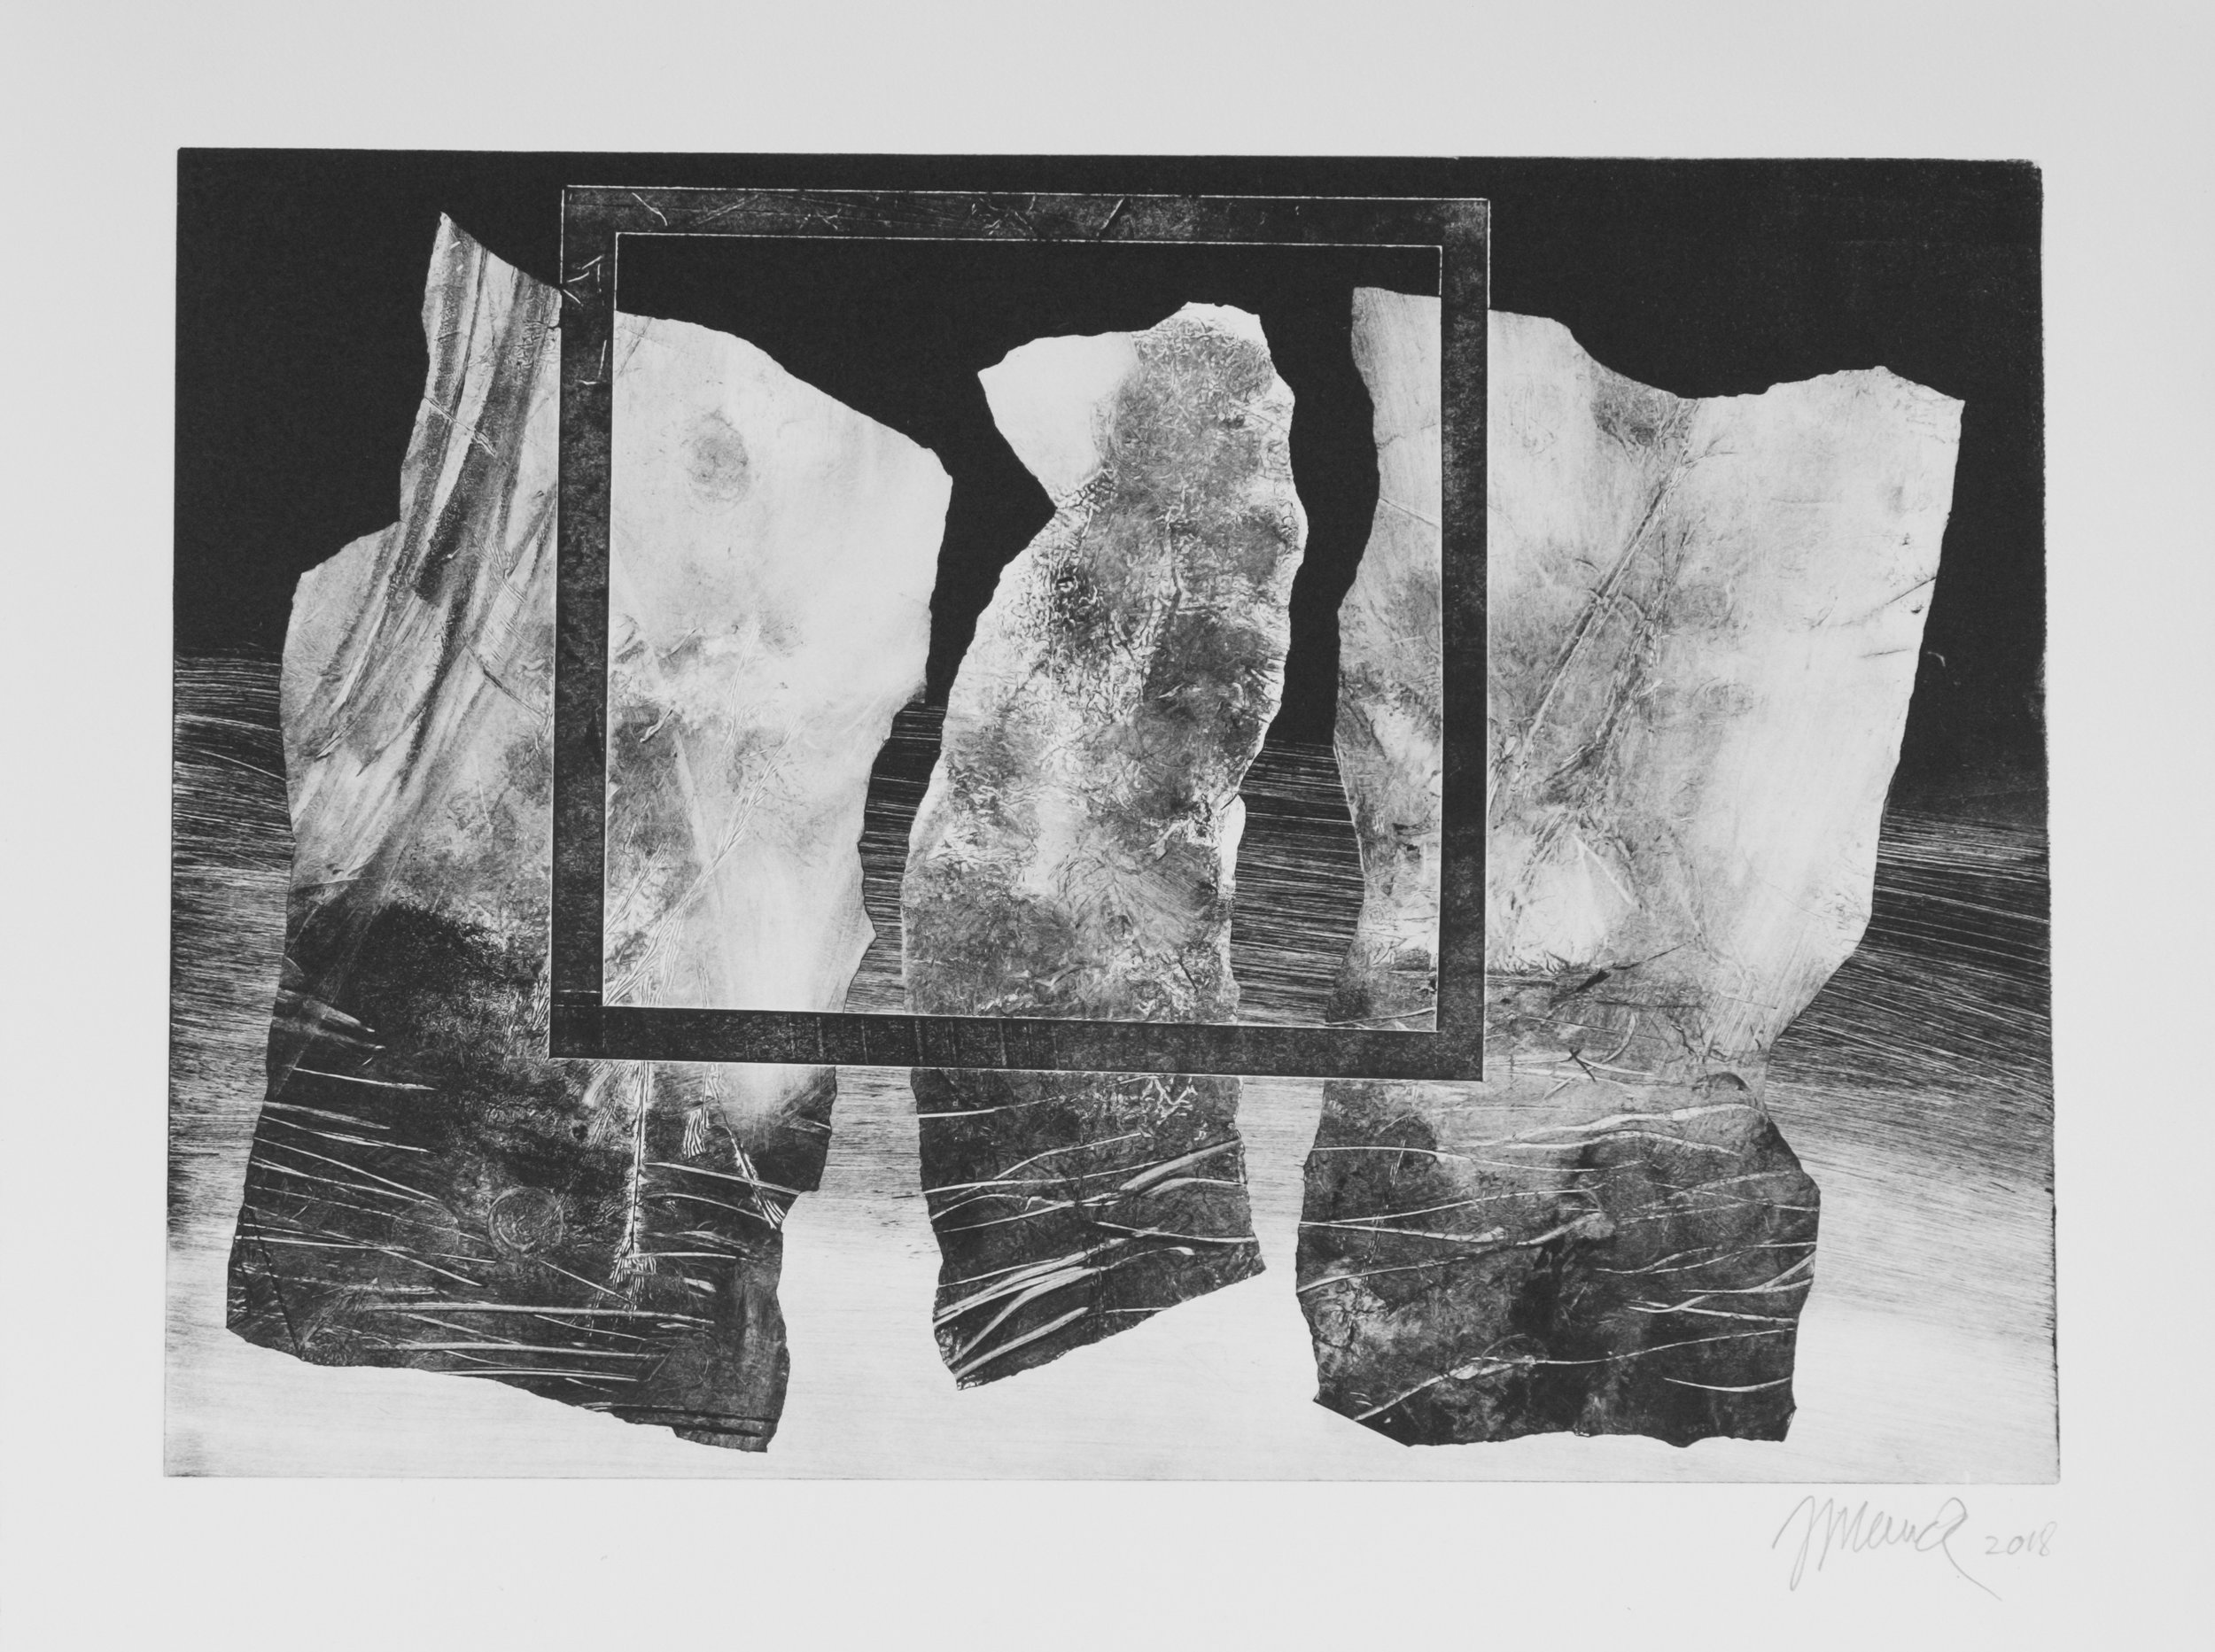 Forms on black 2 (34 cm x 24 cm)